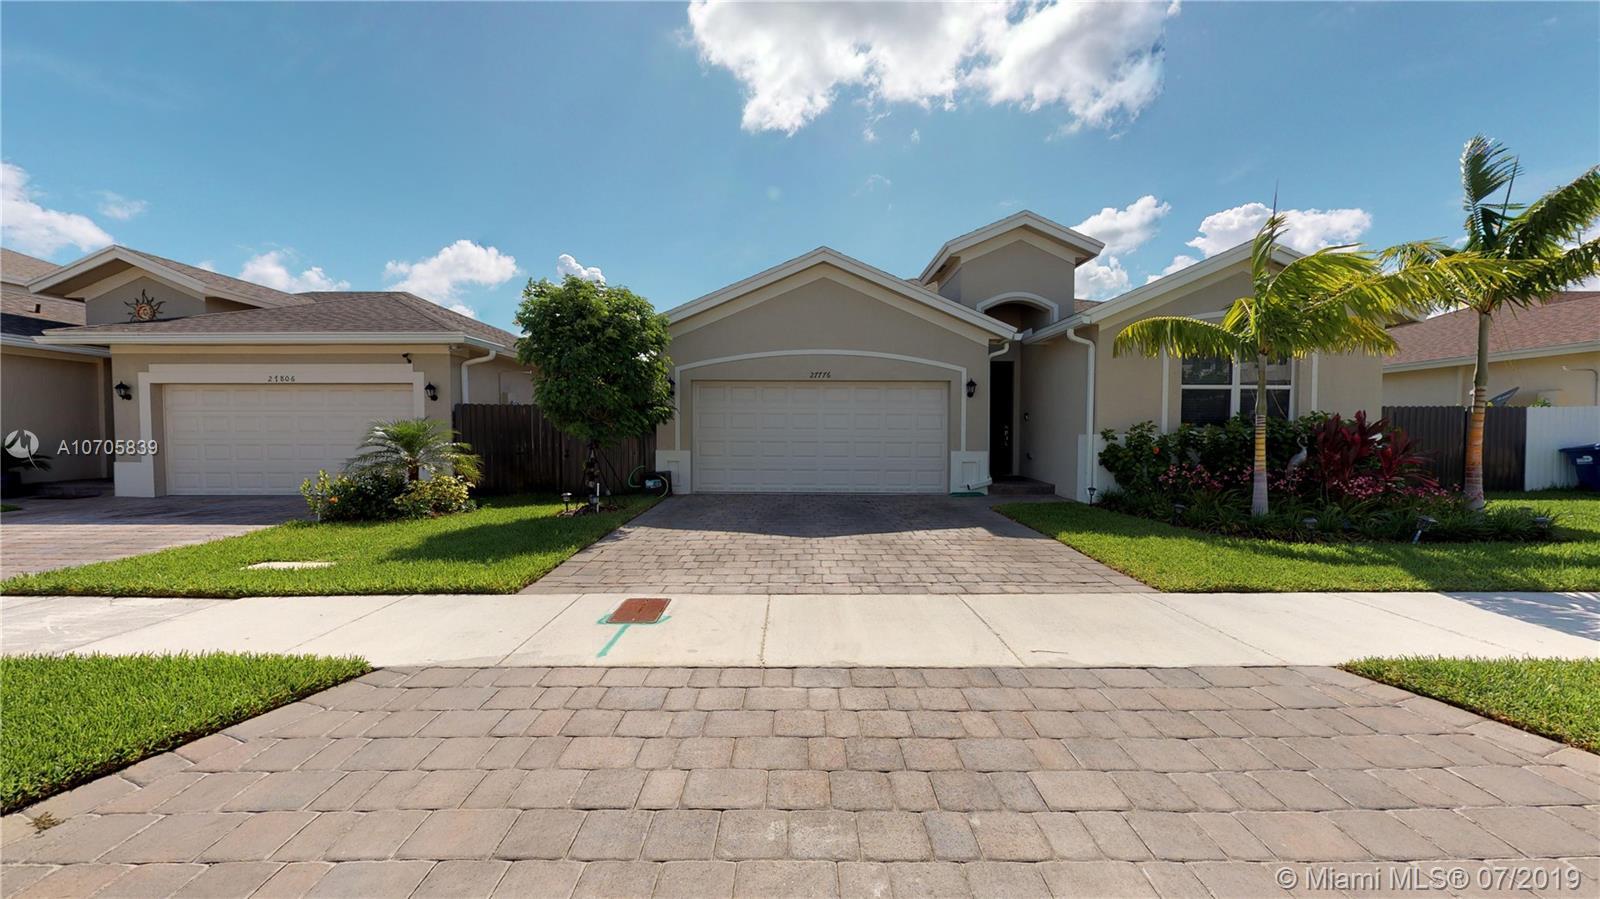 27776 SW 133rd Pl, Homestead, FL 33032 - Homestead, FL real estate listing